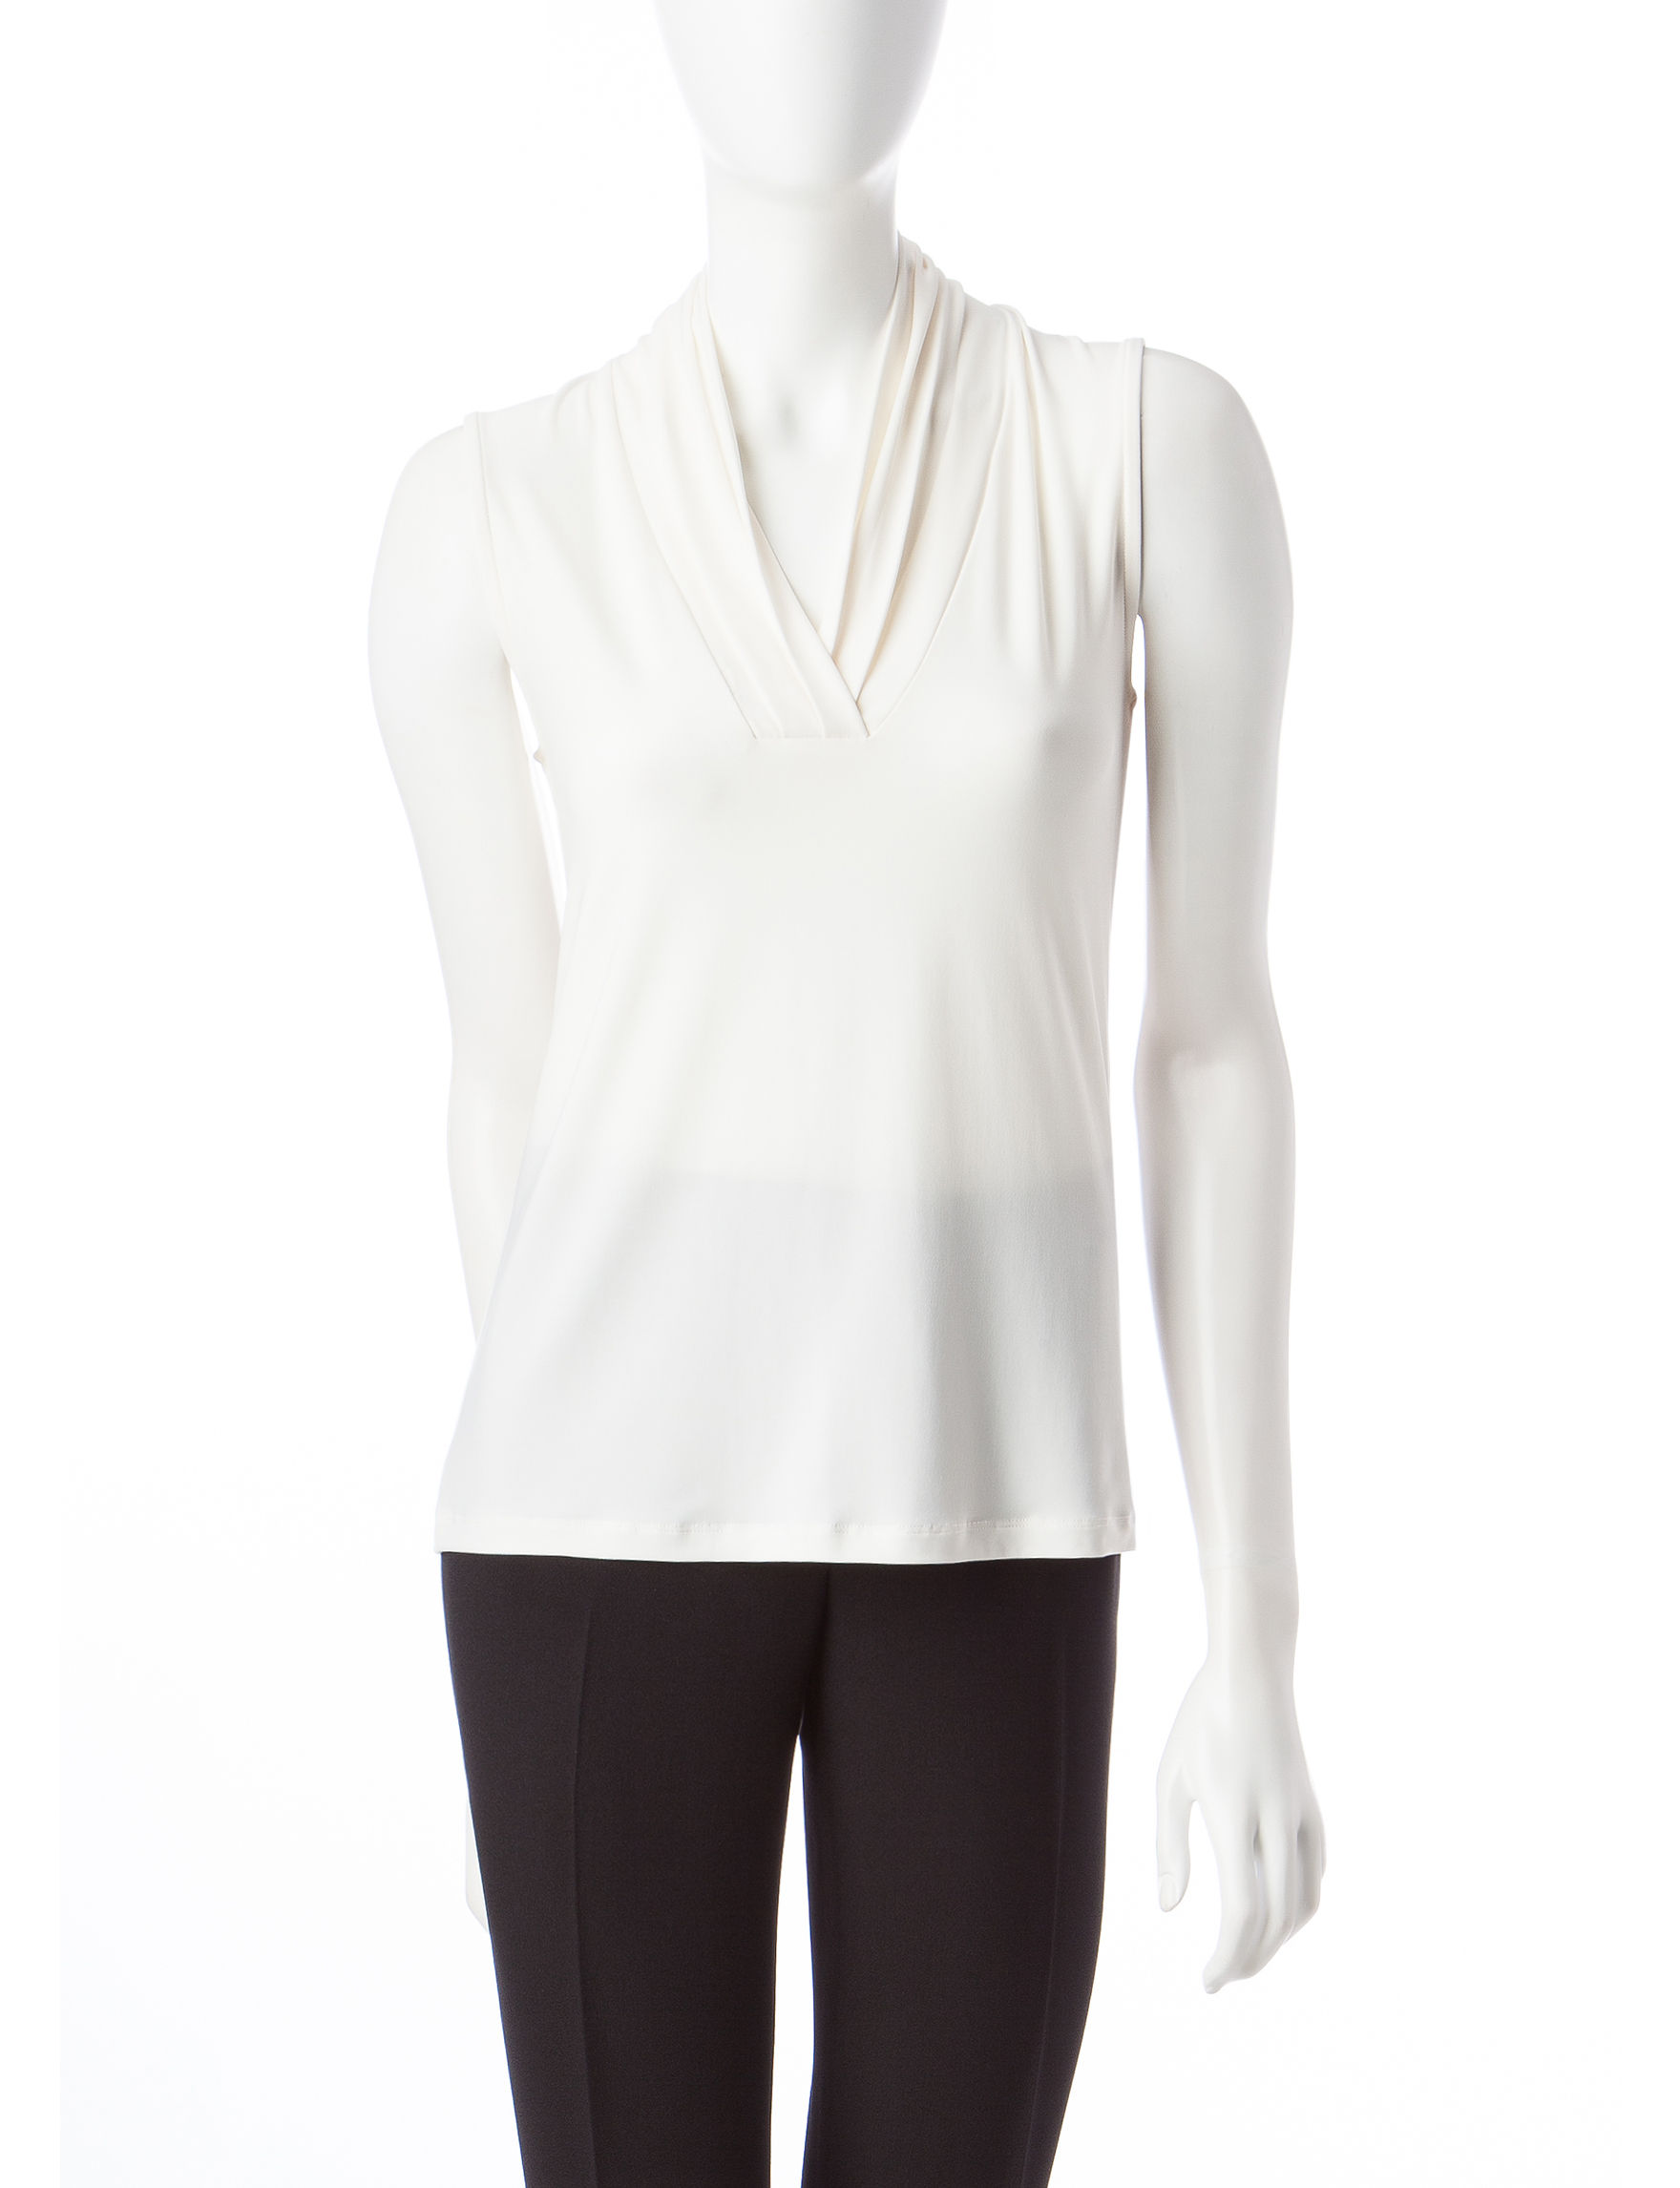 Anne Klein White Shirts & Blouses